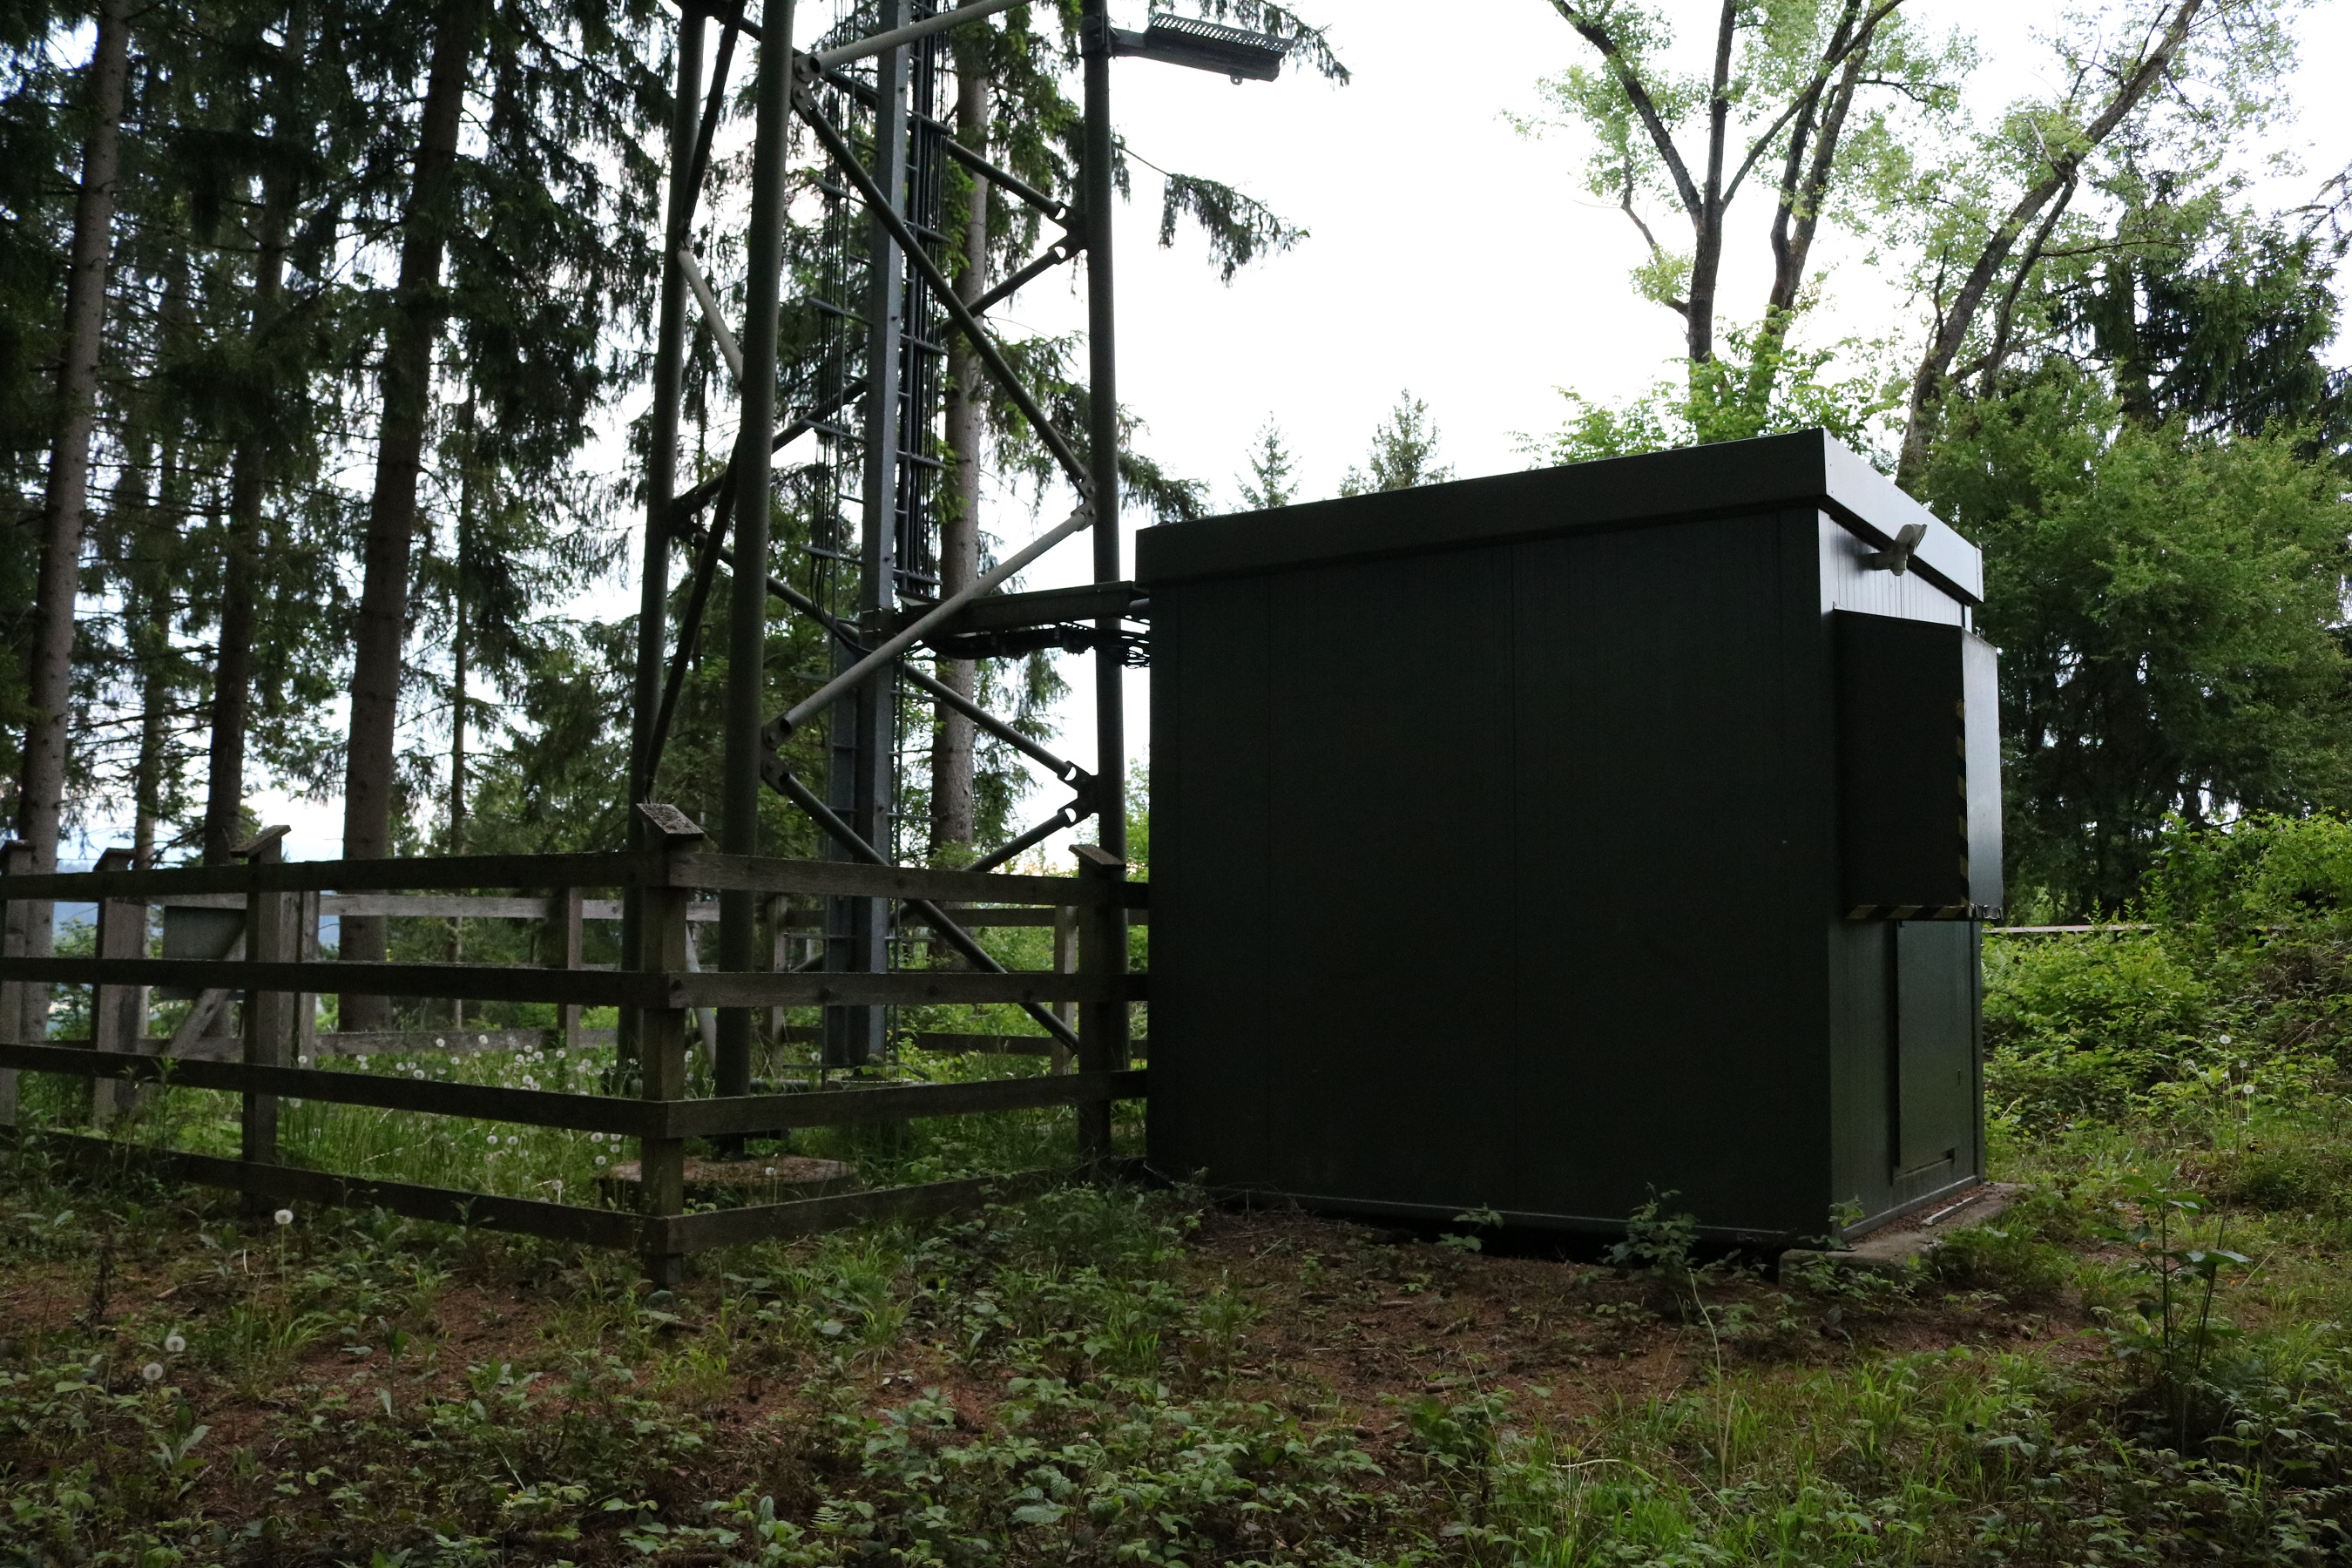 Sender Zensweg St. Veit - Container